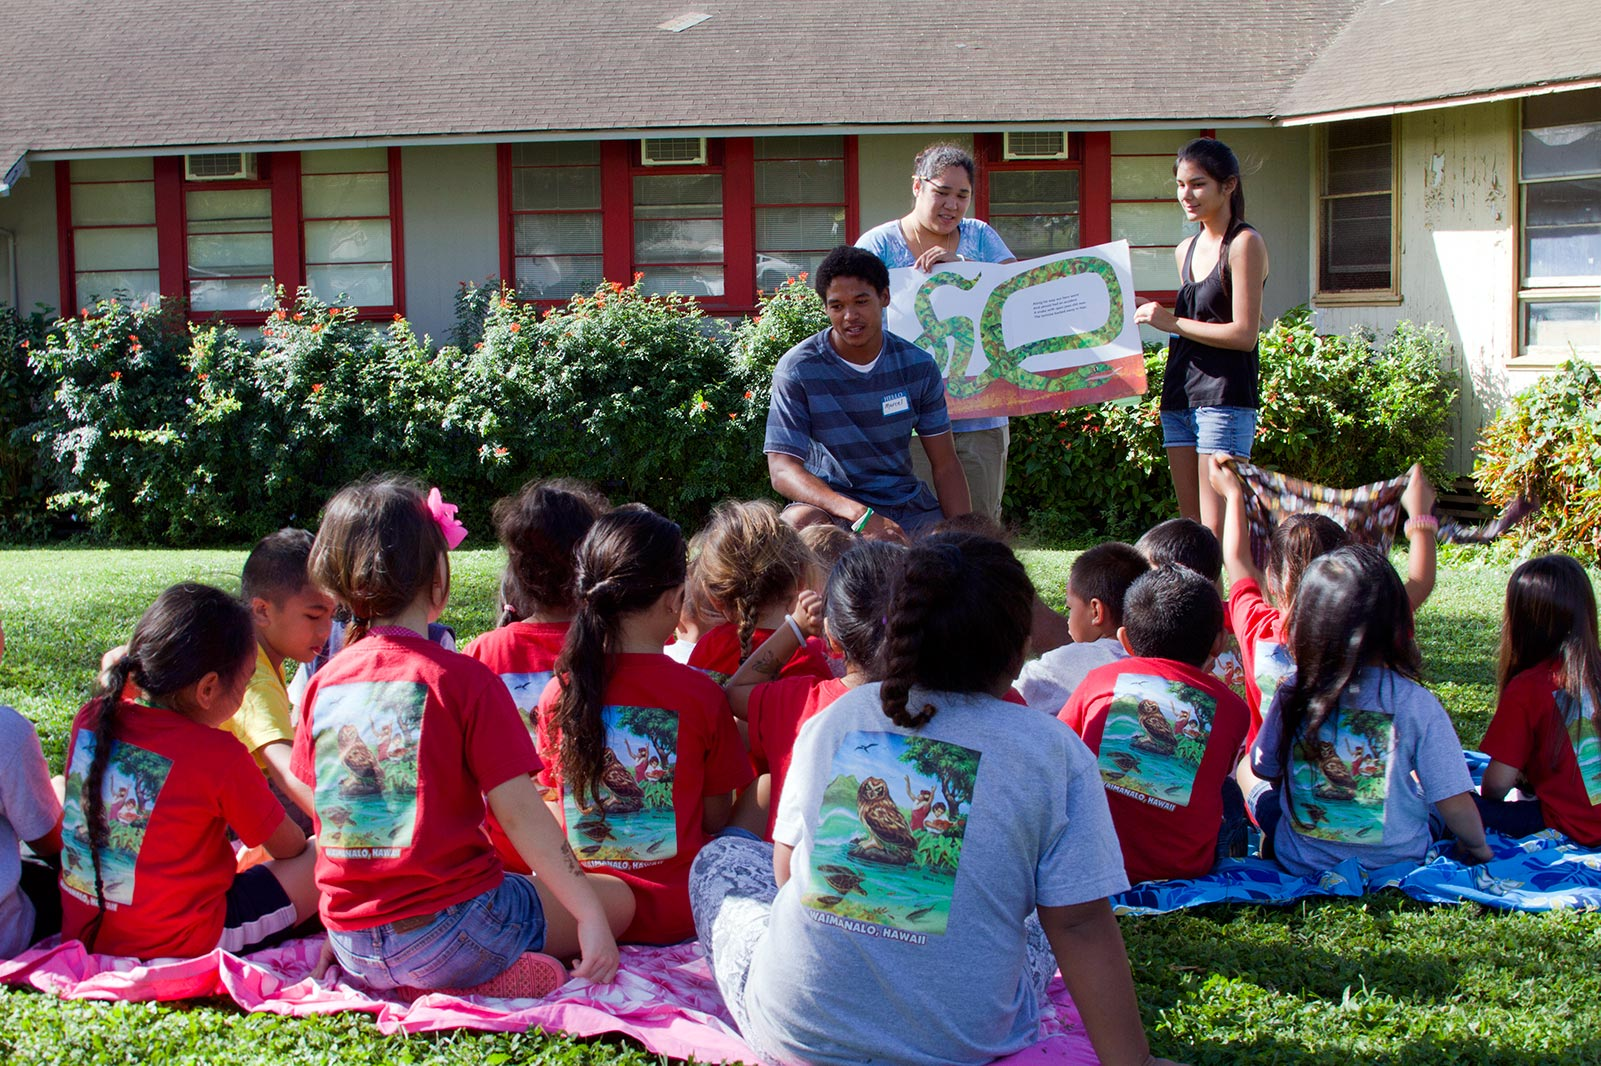 Elementary education students teaching children